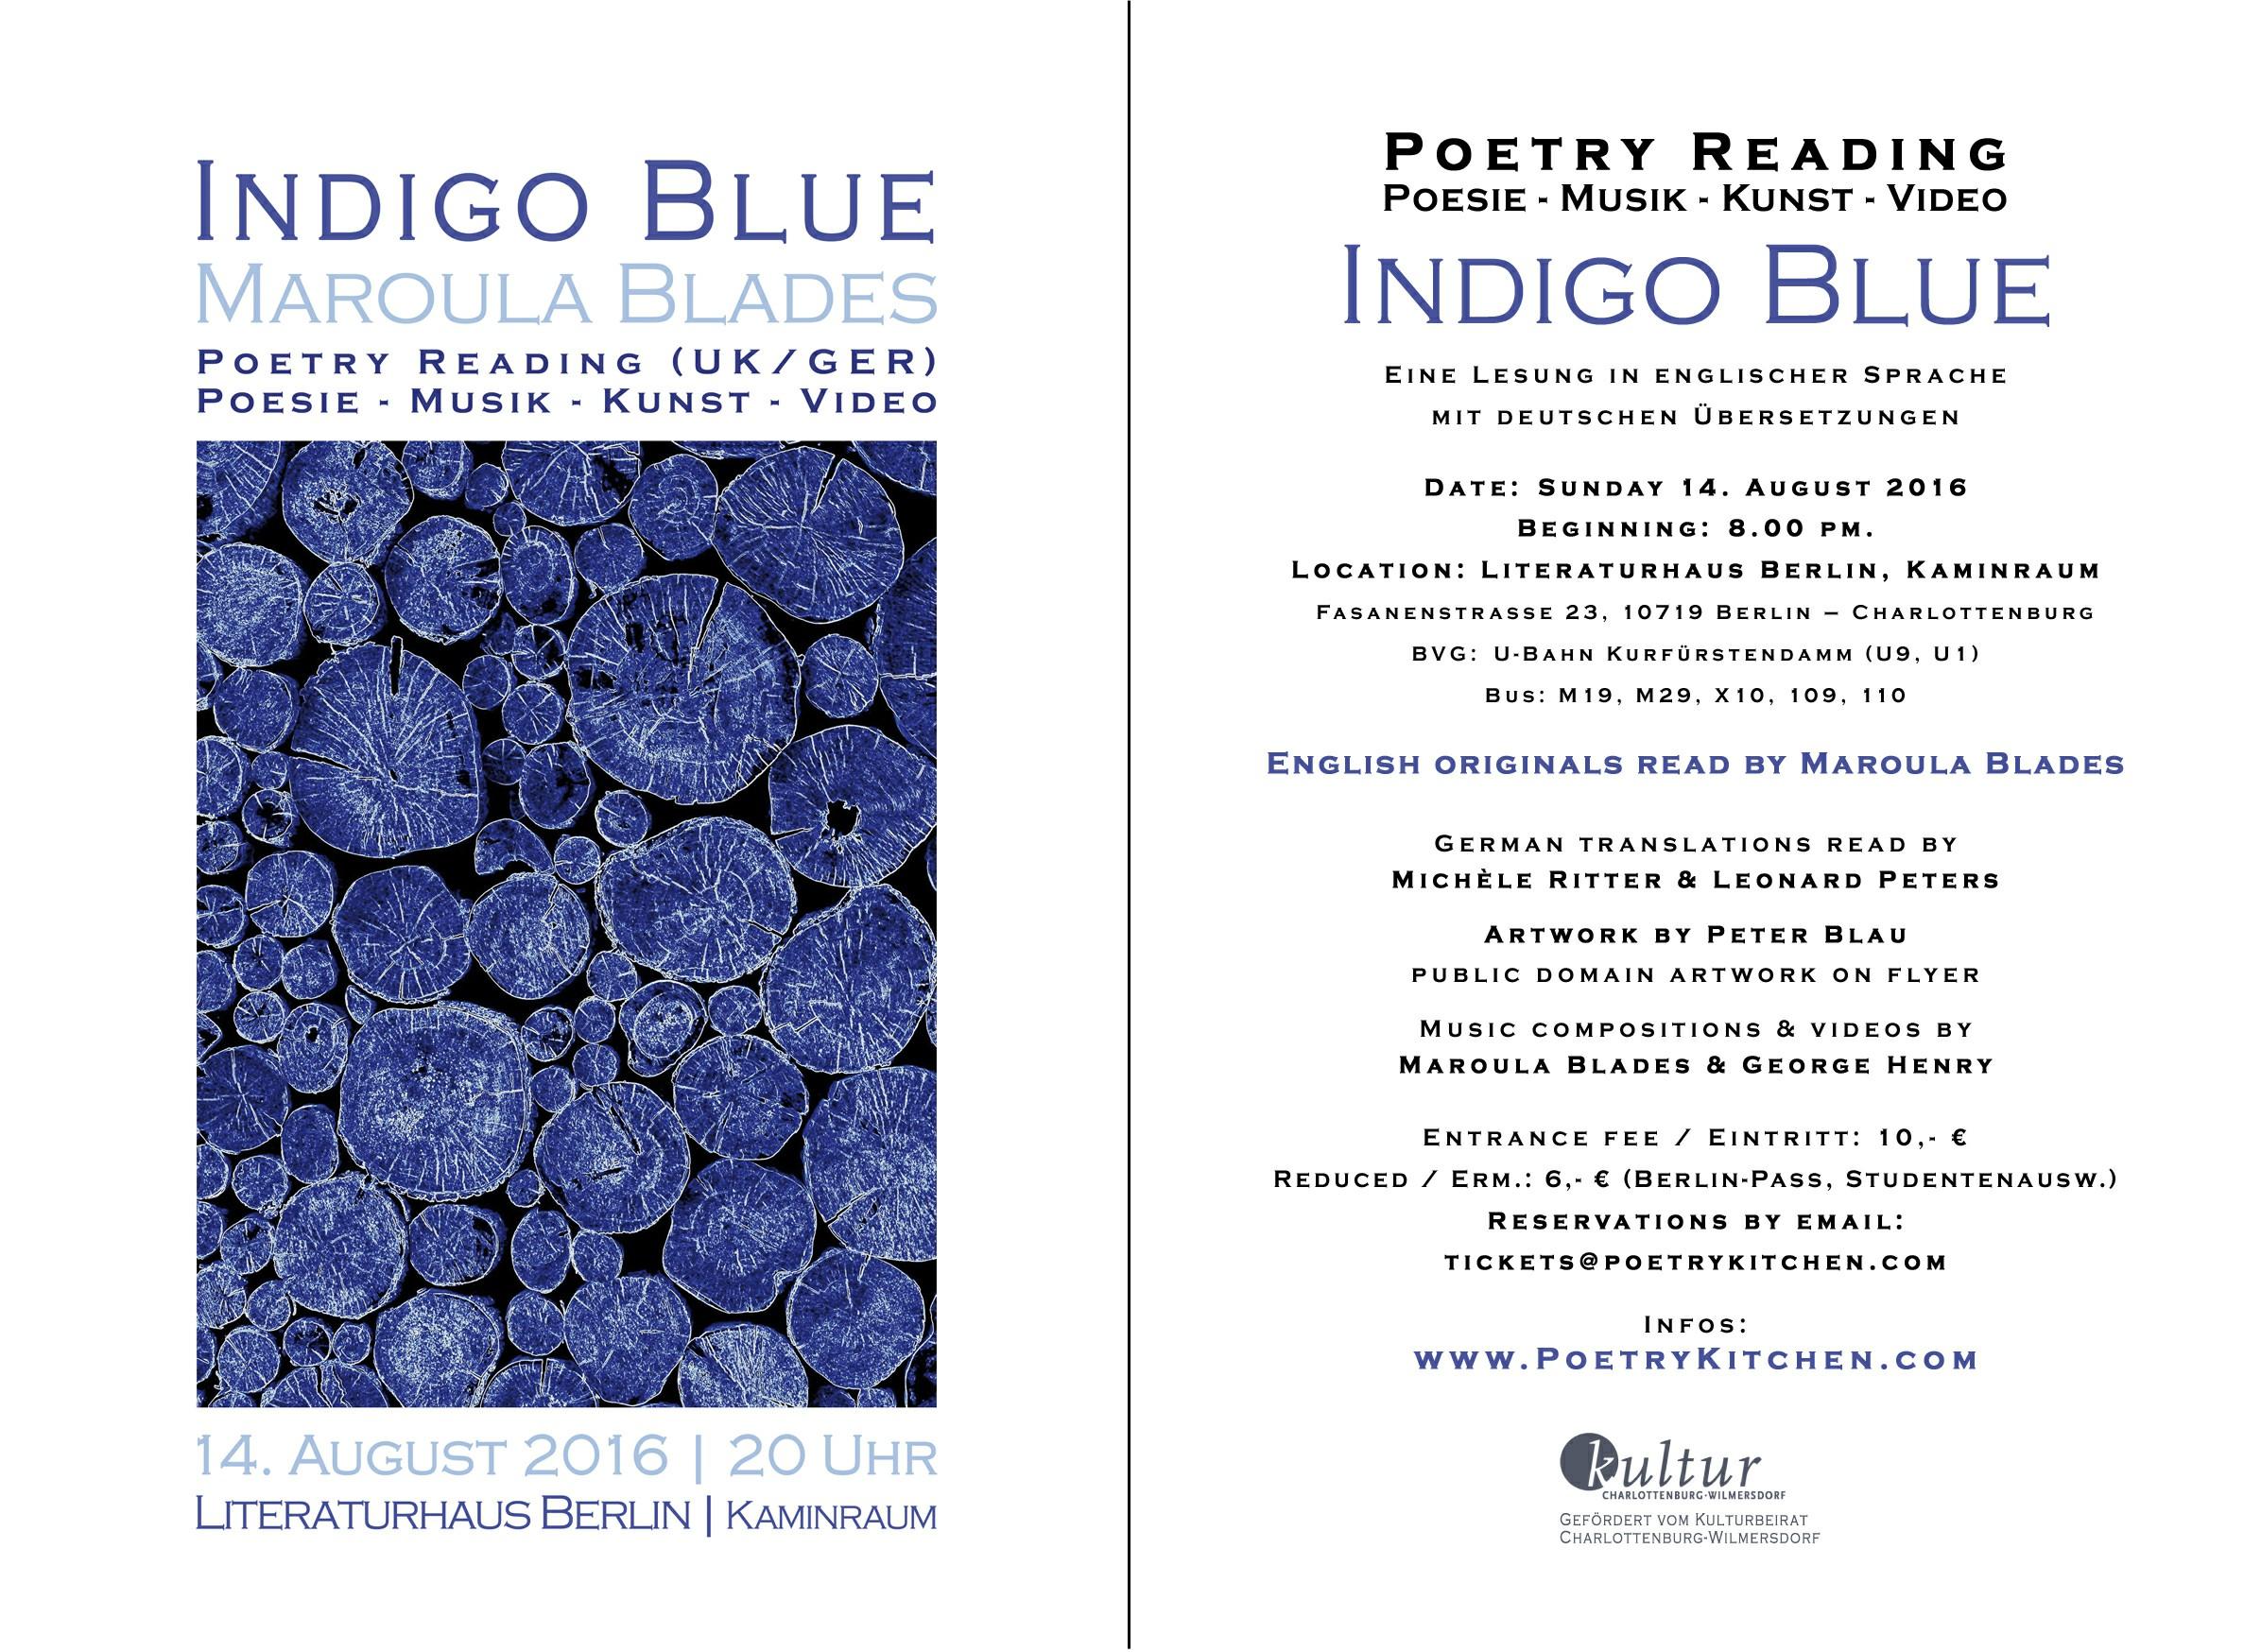 email flyer - Maroula Blades - INDIGO BLUE